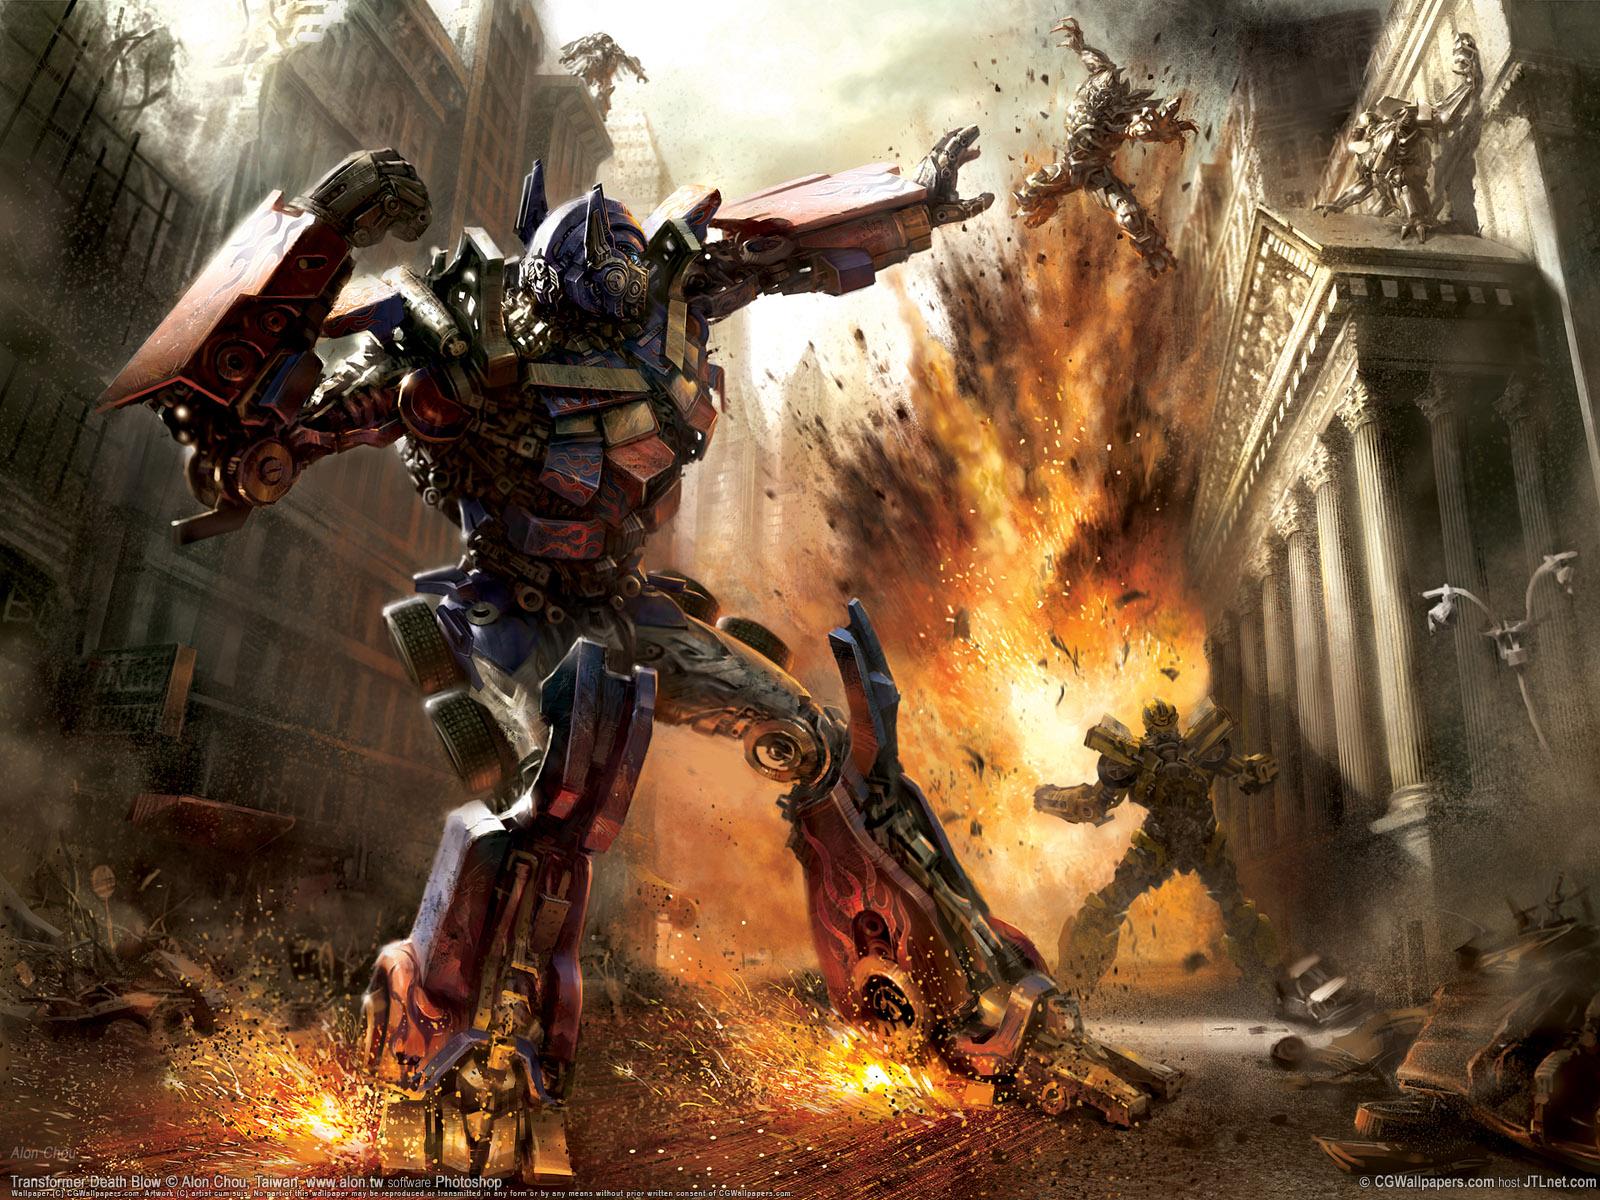 http://3.bp.blogspot.com/-tgFr6Yv8VgM/UW9igaK1gLI/AAAAAAAAroY/8NWCEojF85k/s1600/Transformers+wallpaper+(6).jpg